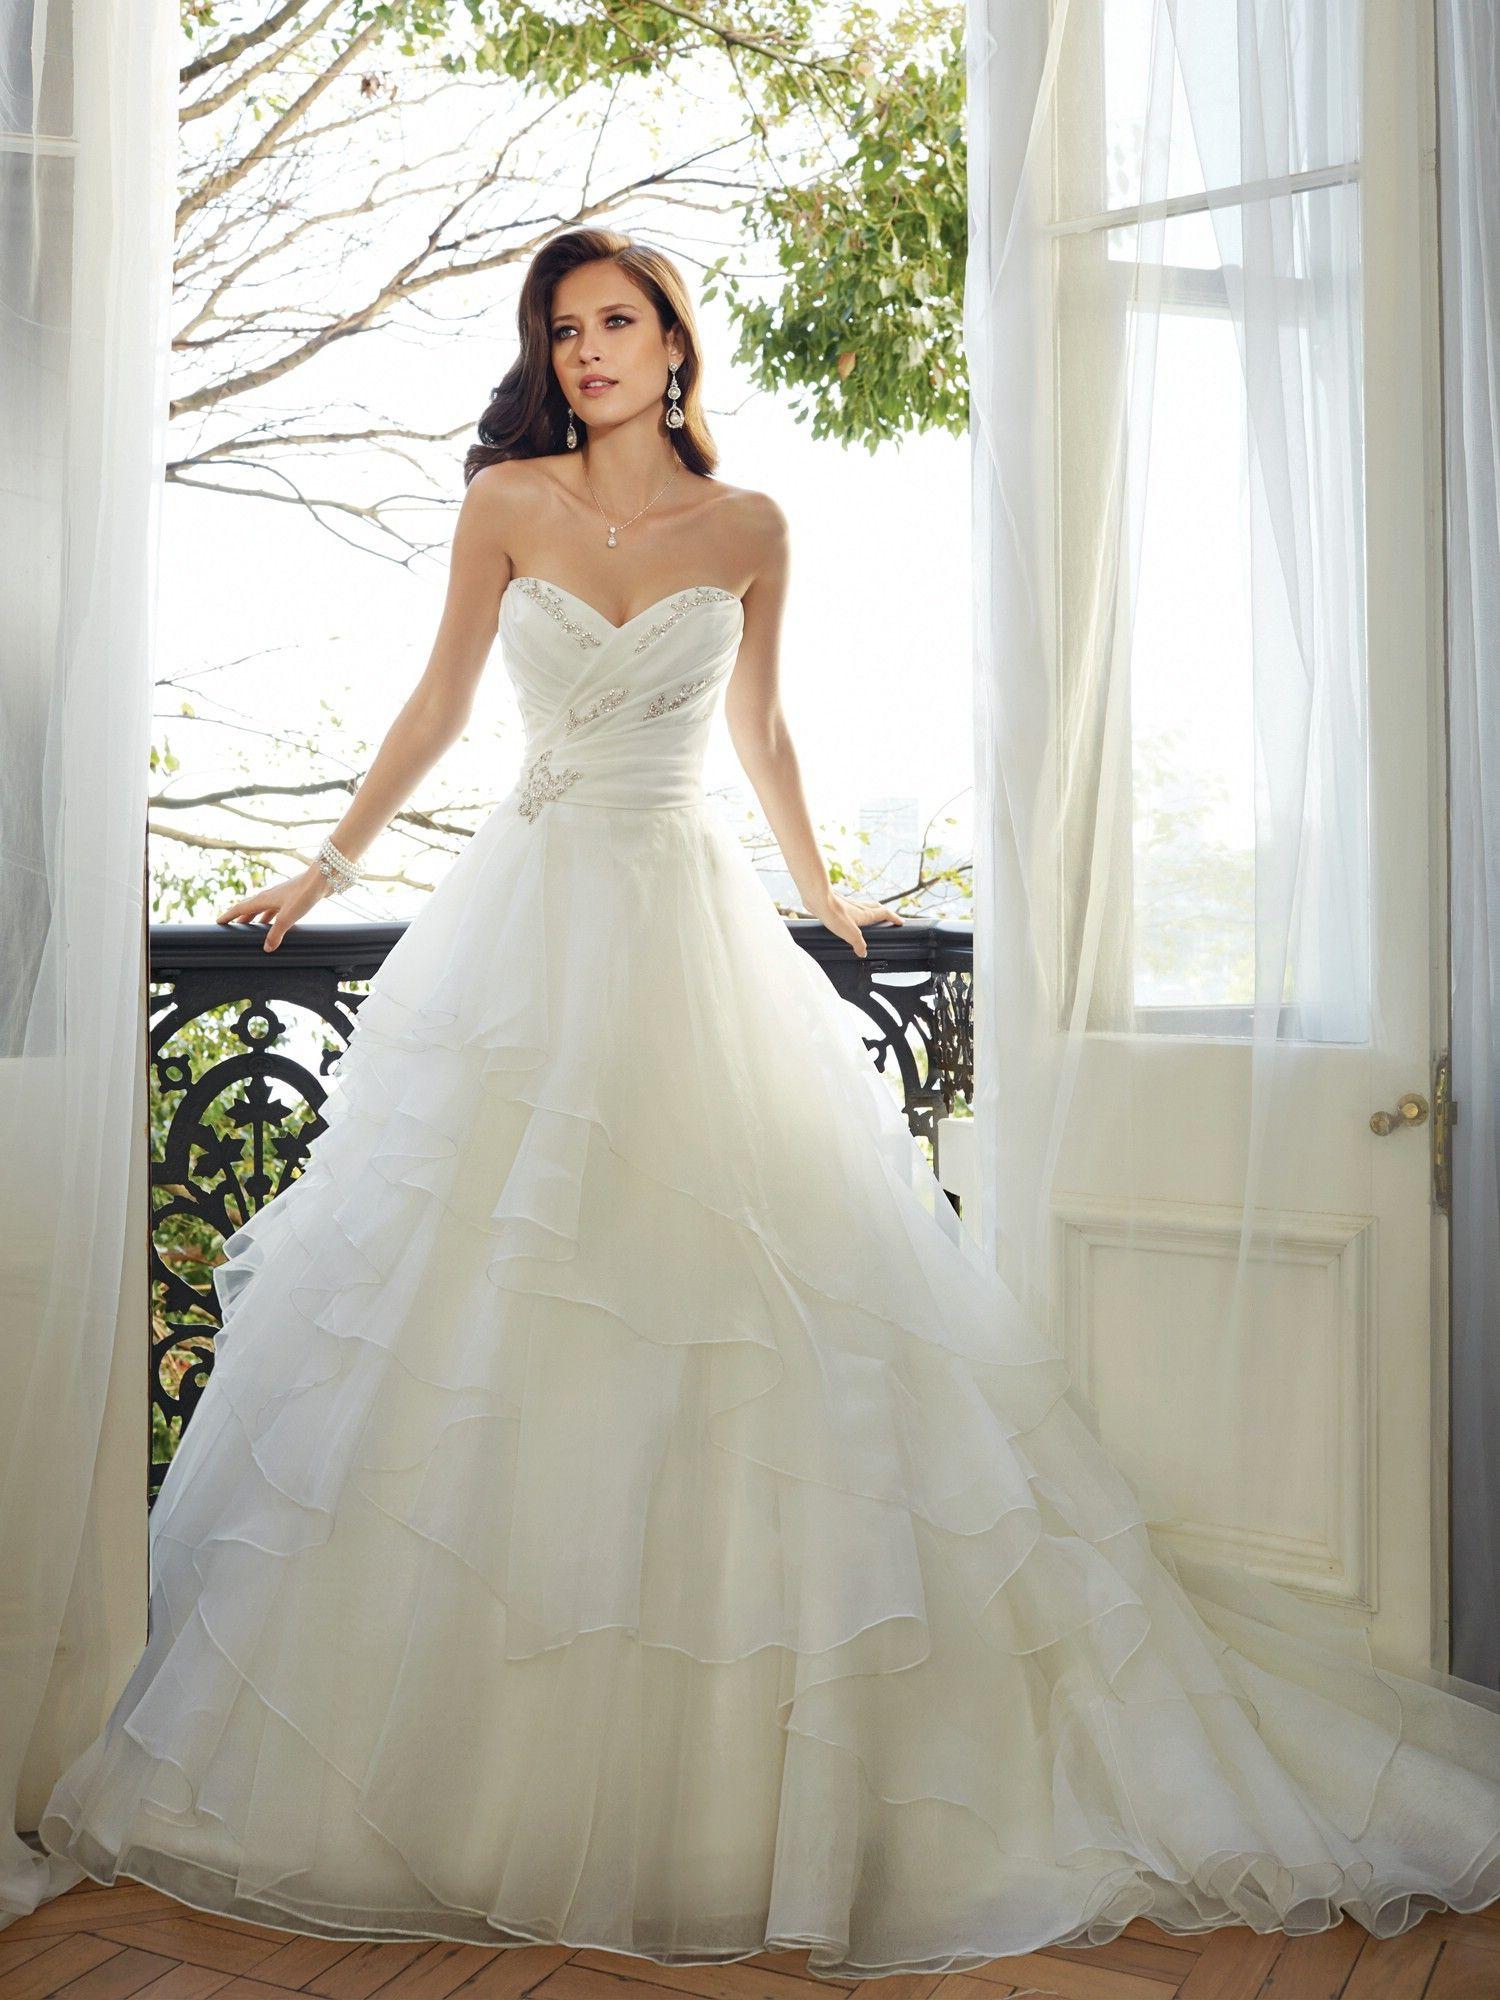 Sophia Tolli Wedding Dresses Style Egret Y11565 1 348 00 Spring 2017